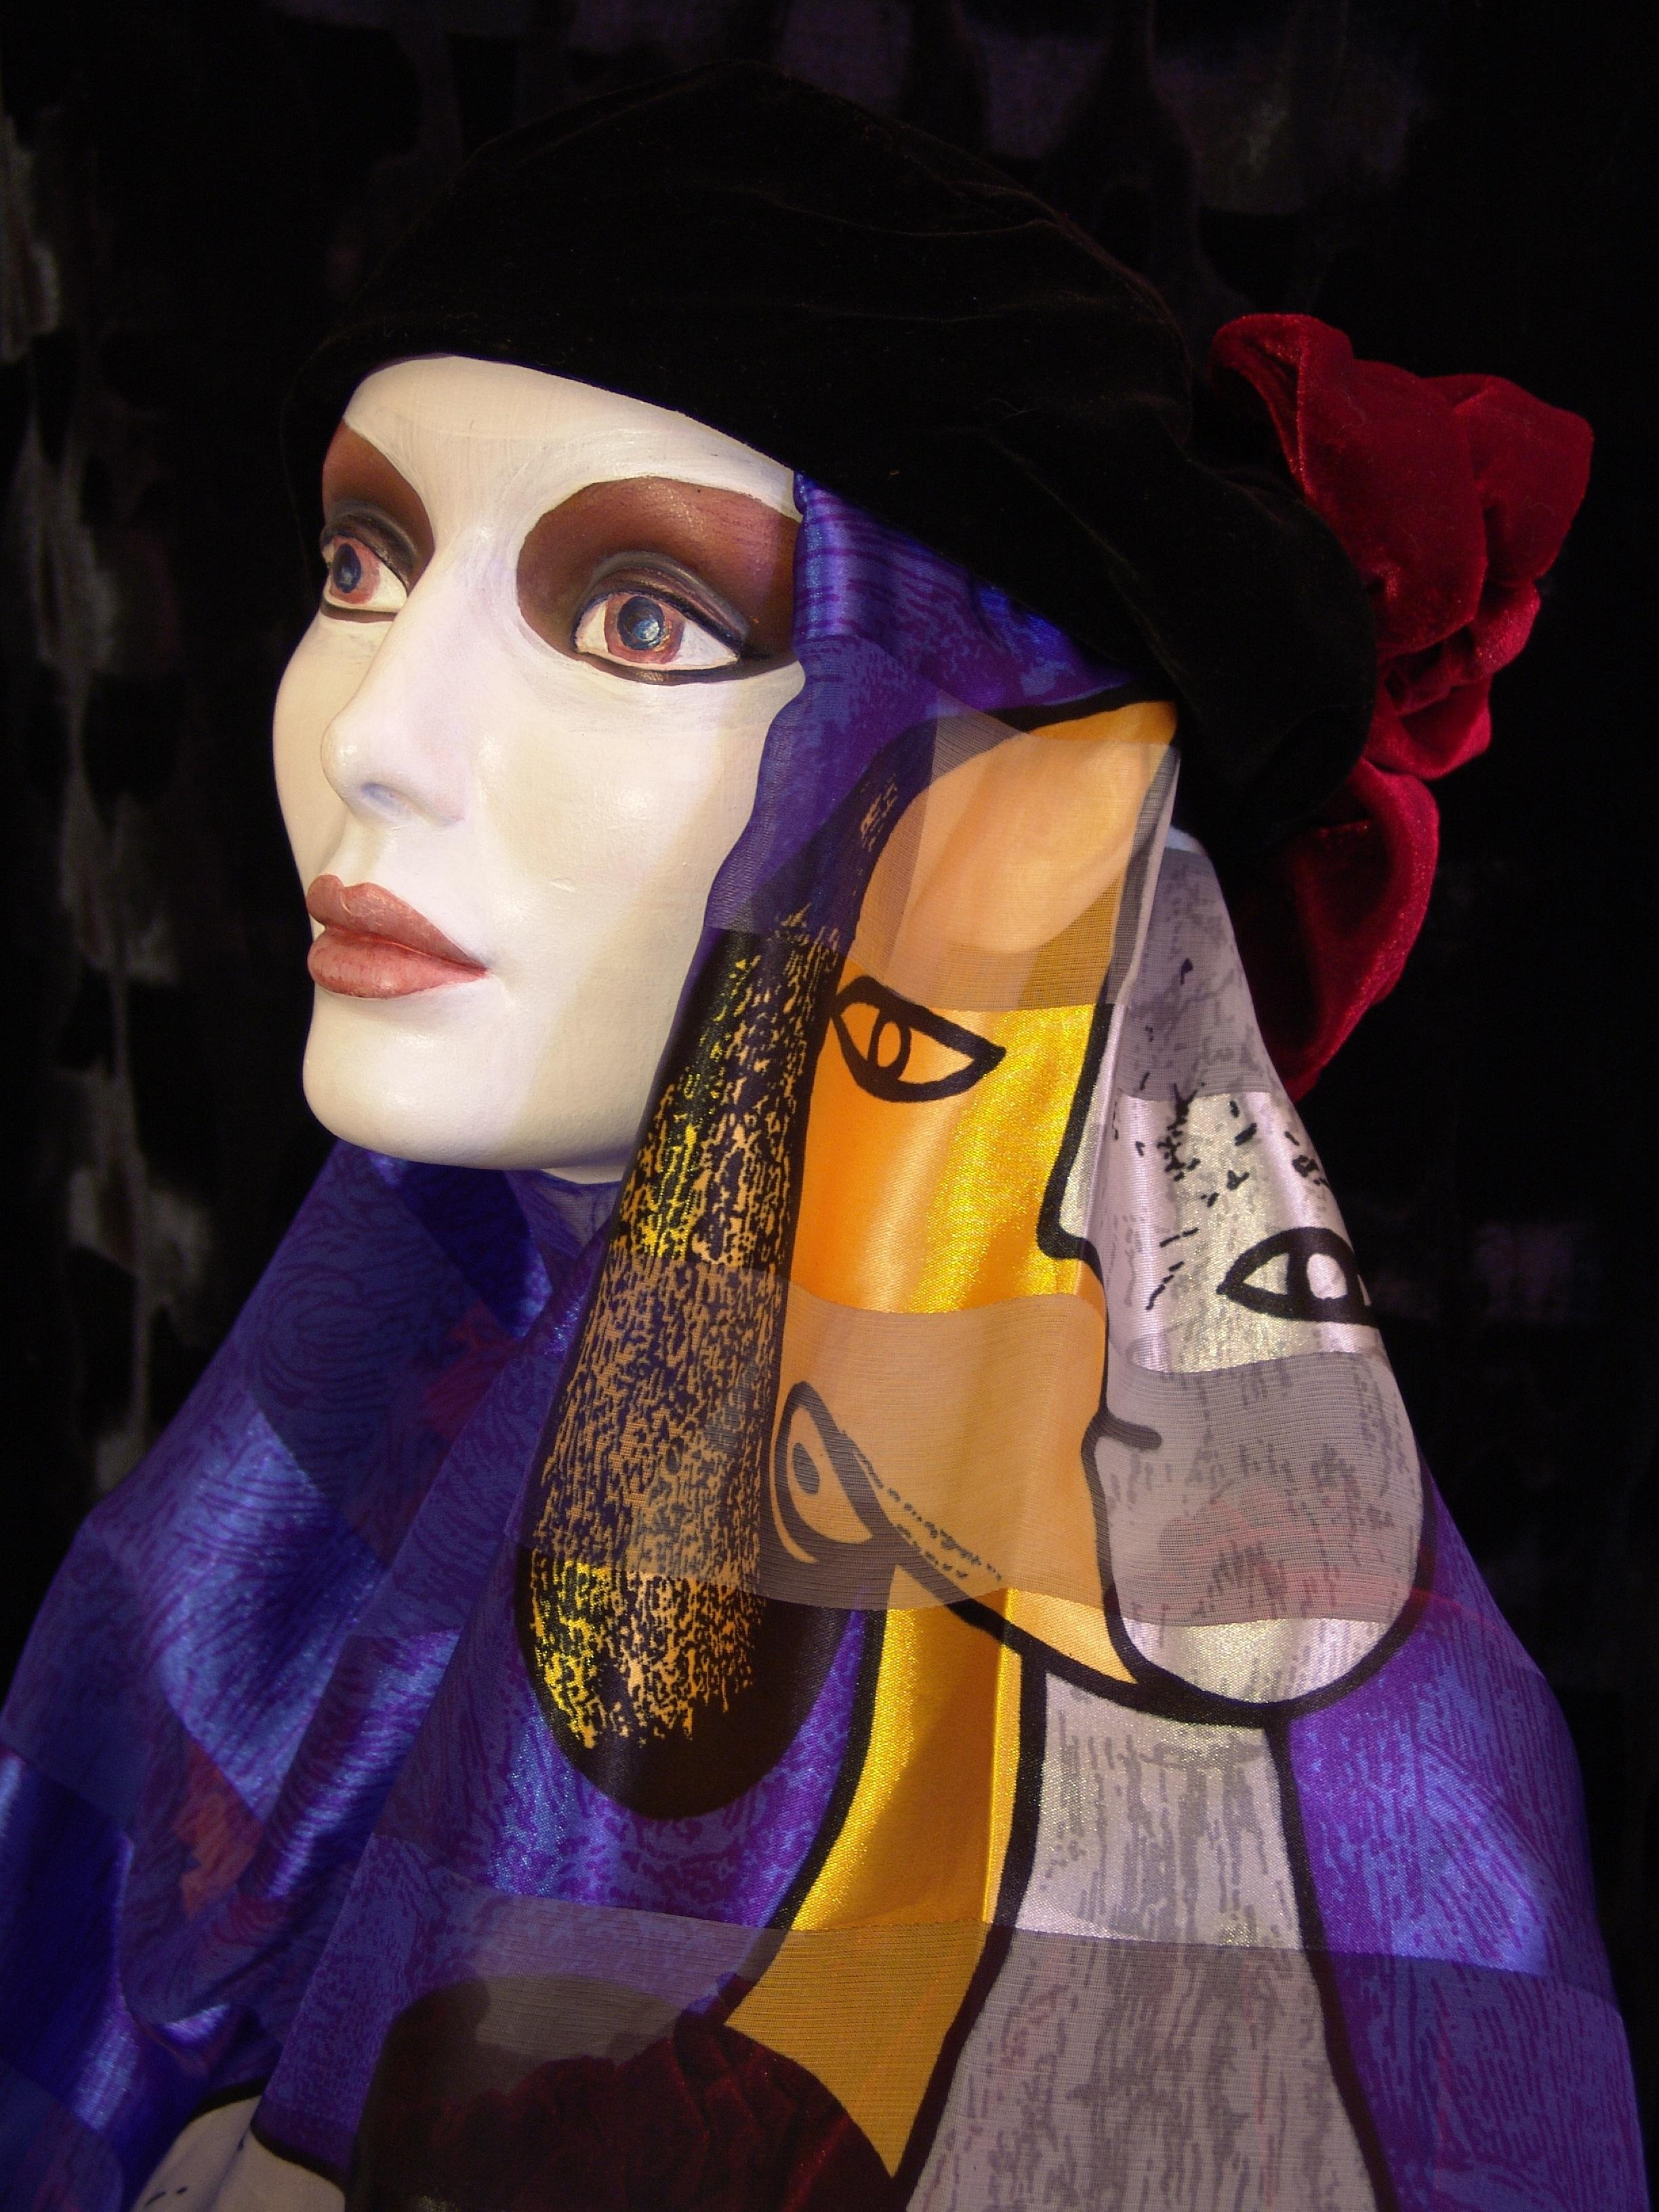 ungu warna topi mode biru pakaian hitam kuning wanita cosplay kostum picasso topi hitam Manekin wanita